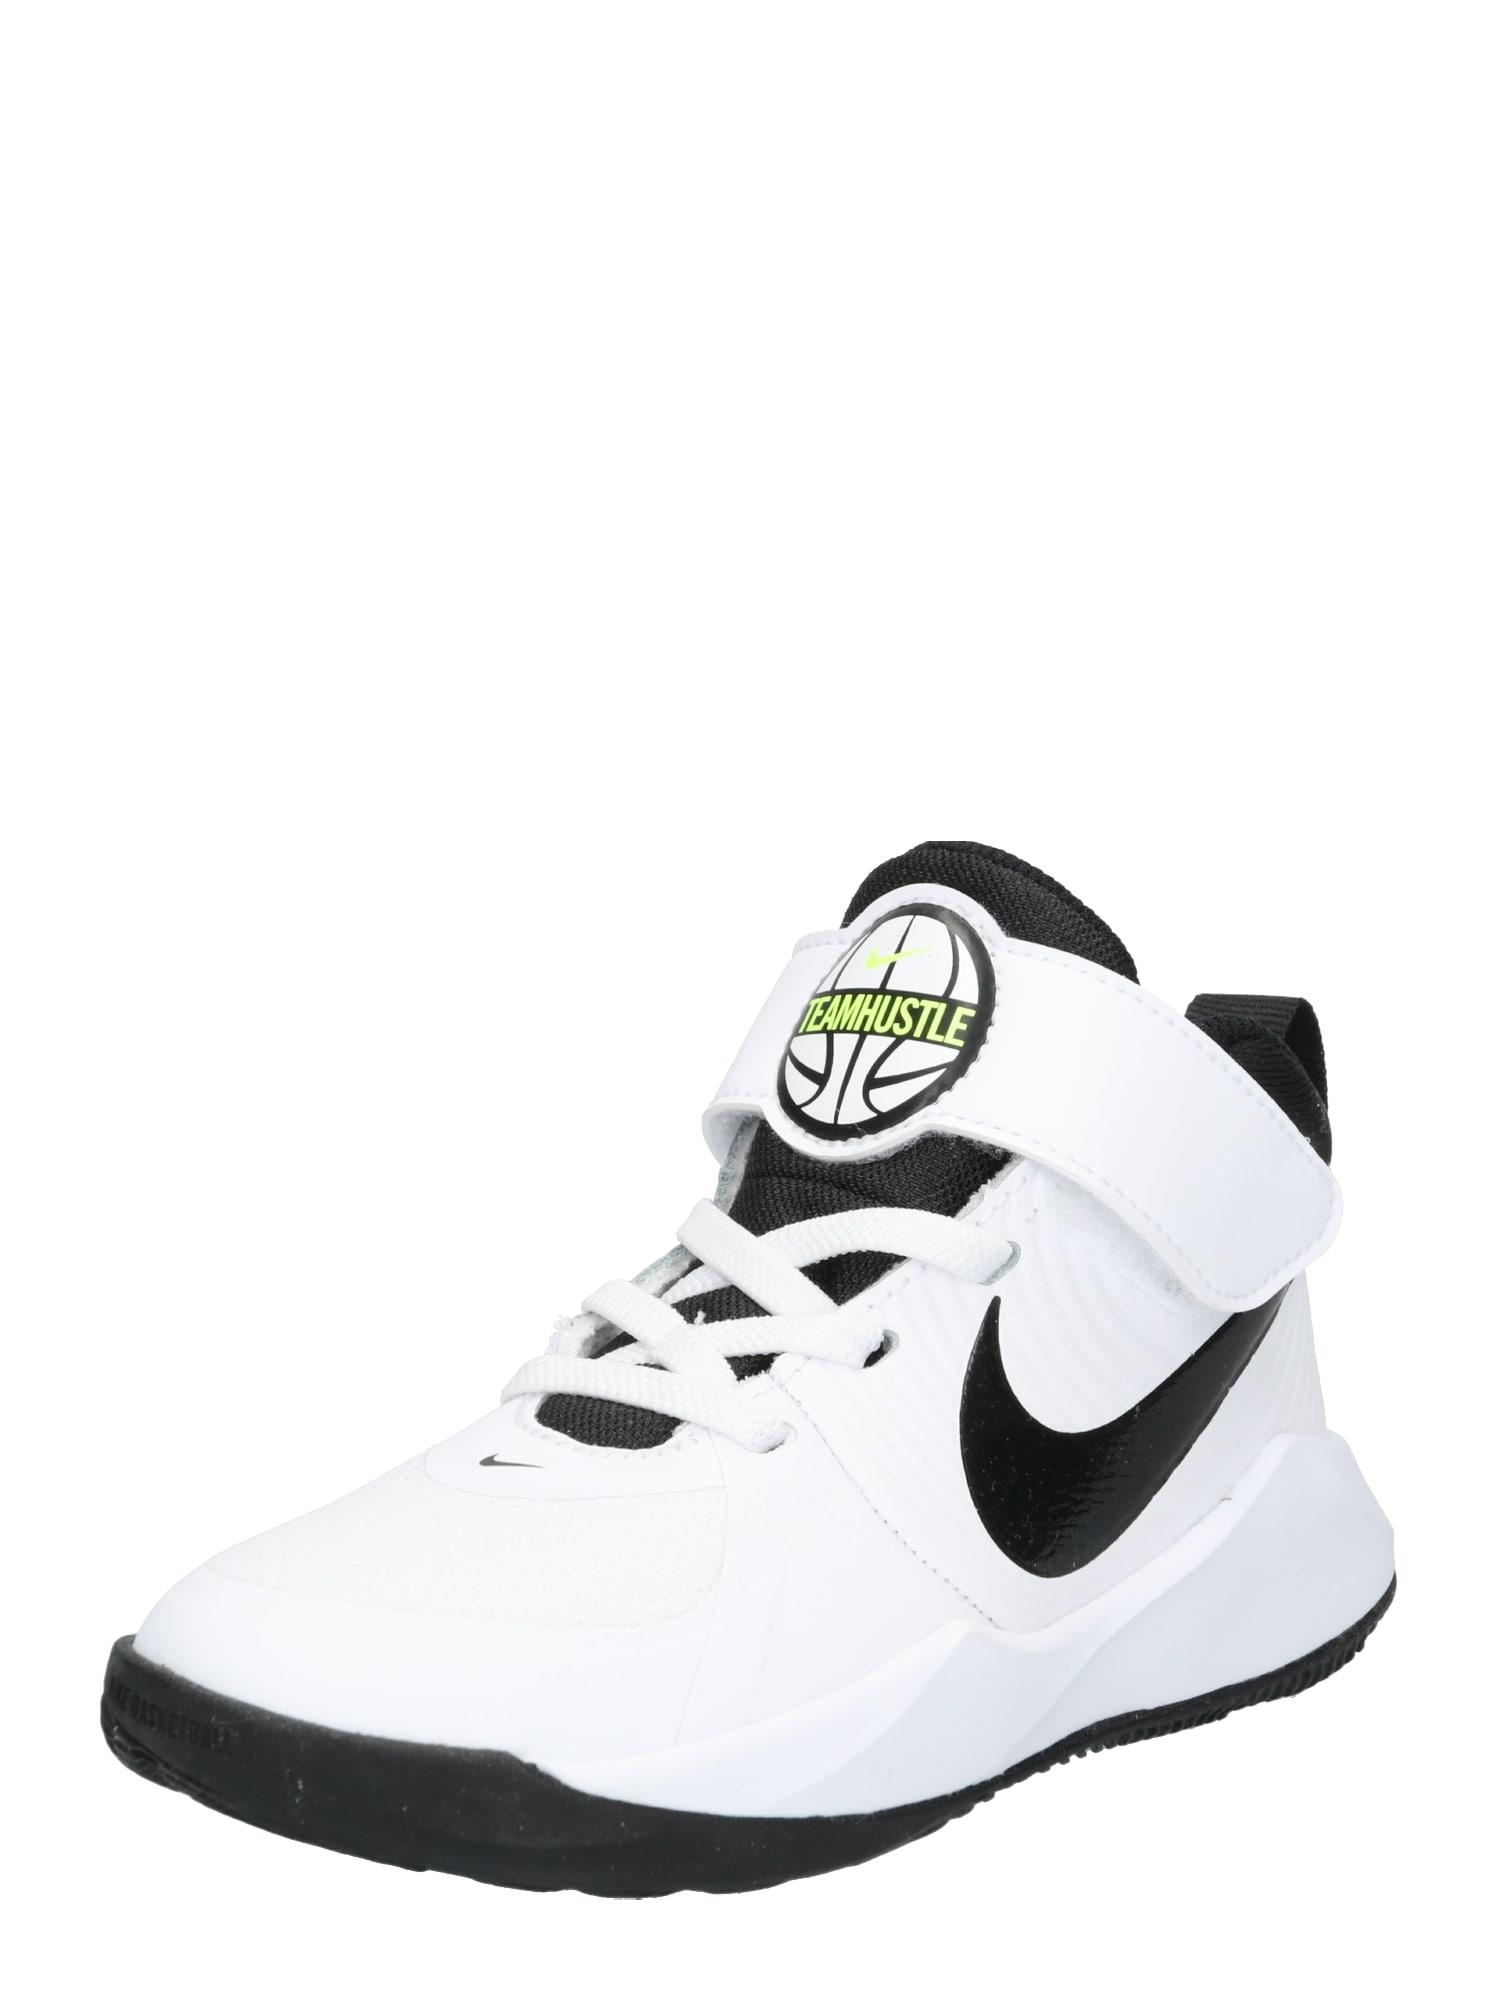 NIKE Chaussure de sport 'TEAM HUSTLE D 9 (PS)'  - Blanc - Taille: 13.5C - boy